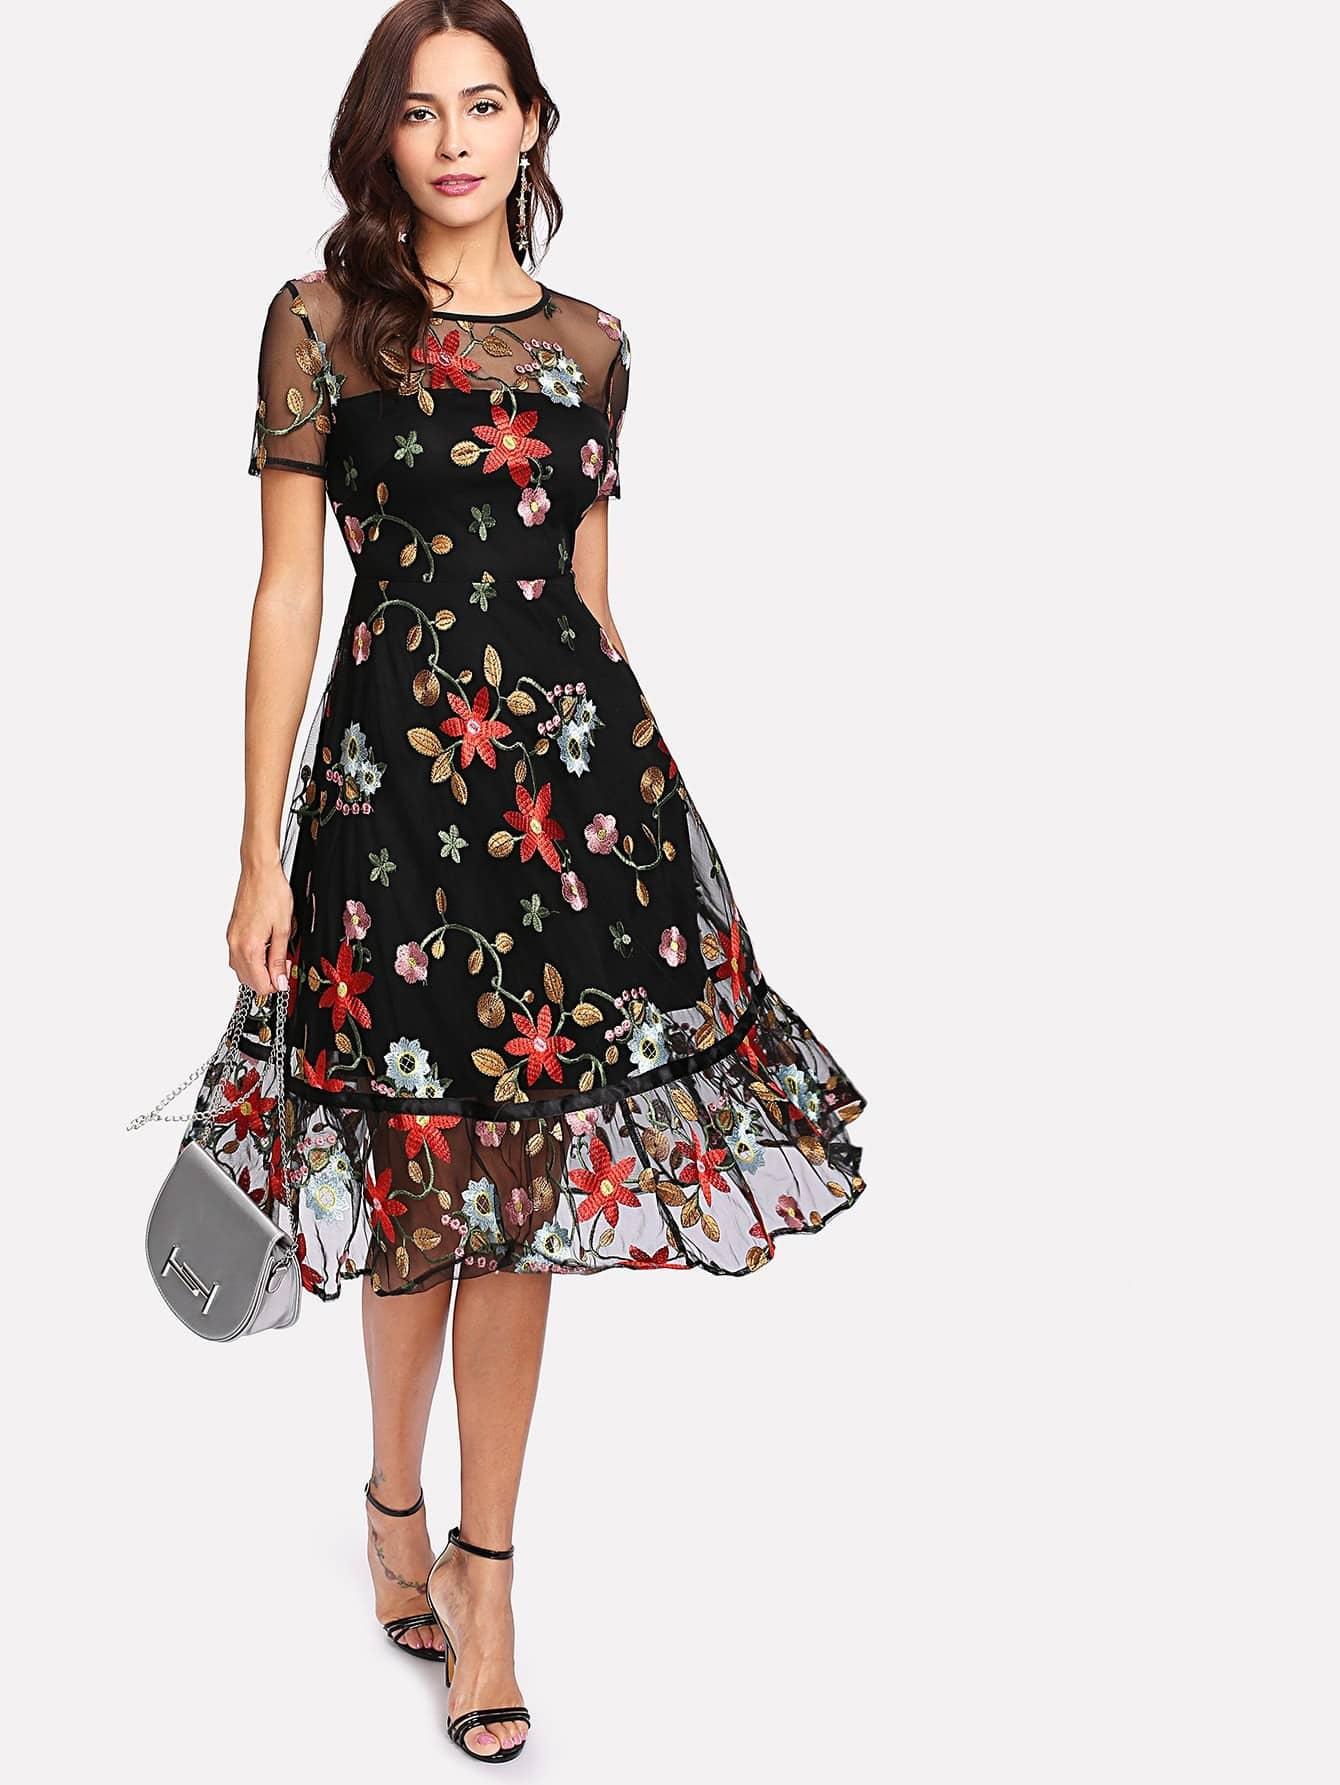 Botanical Embroidery Mesh Overlay Ruffle Hem Dress contrast binding ruffle hem botanical shorts